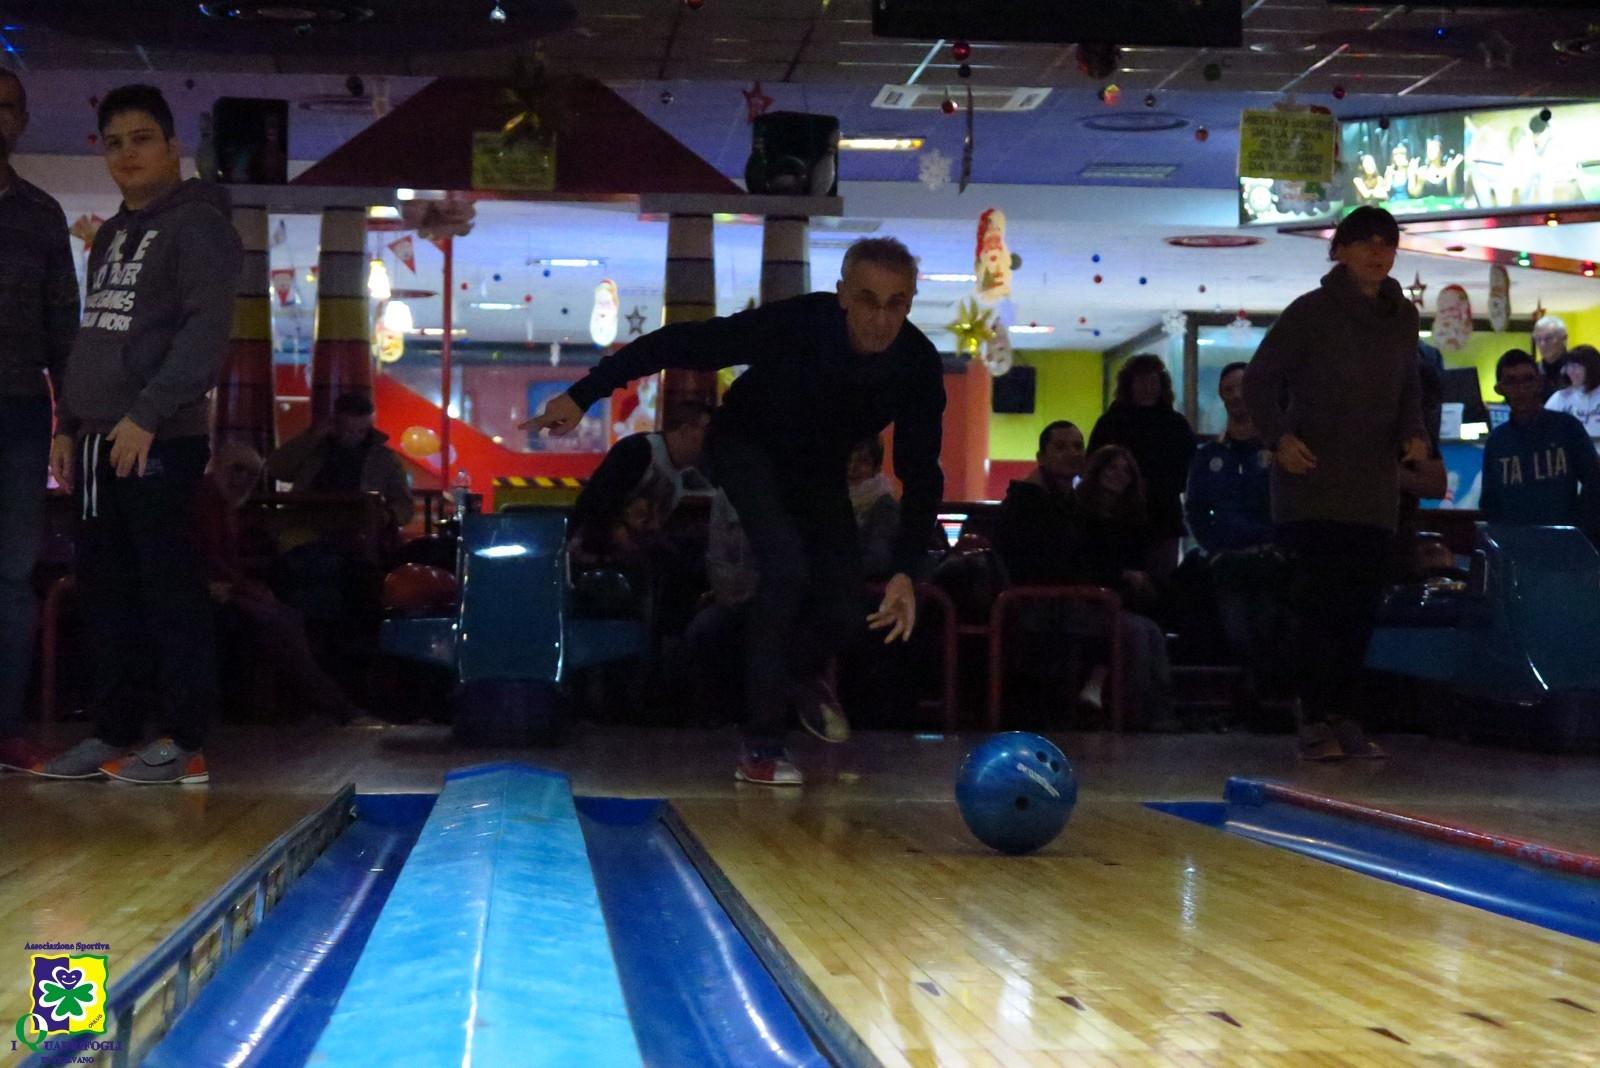 Torneo Bowling Vigevano 19-12-2018 - 038